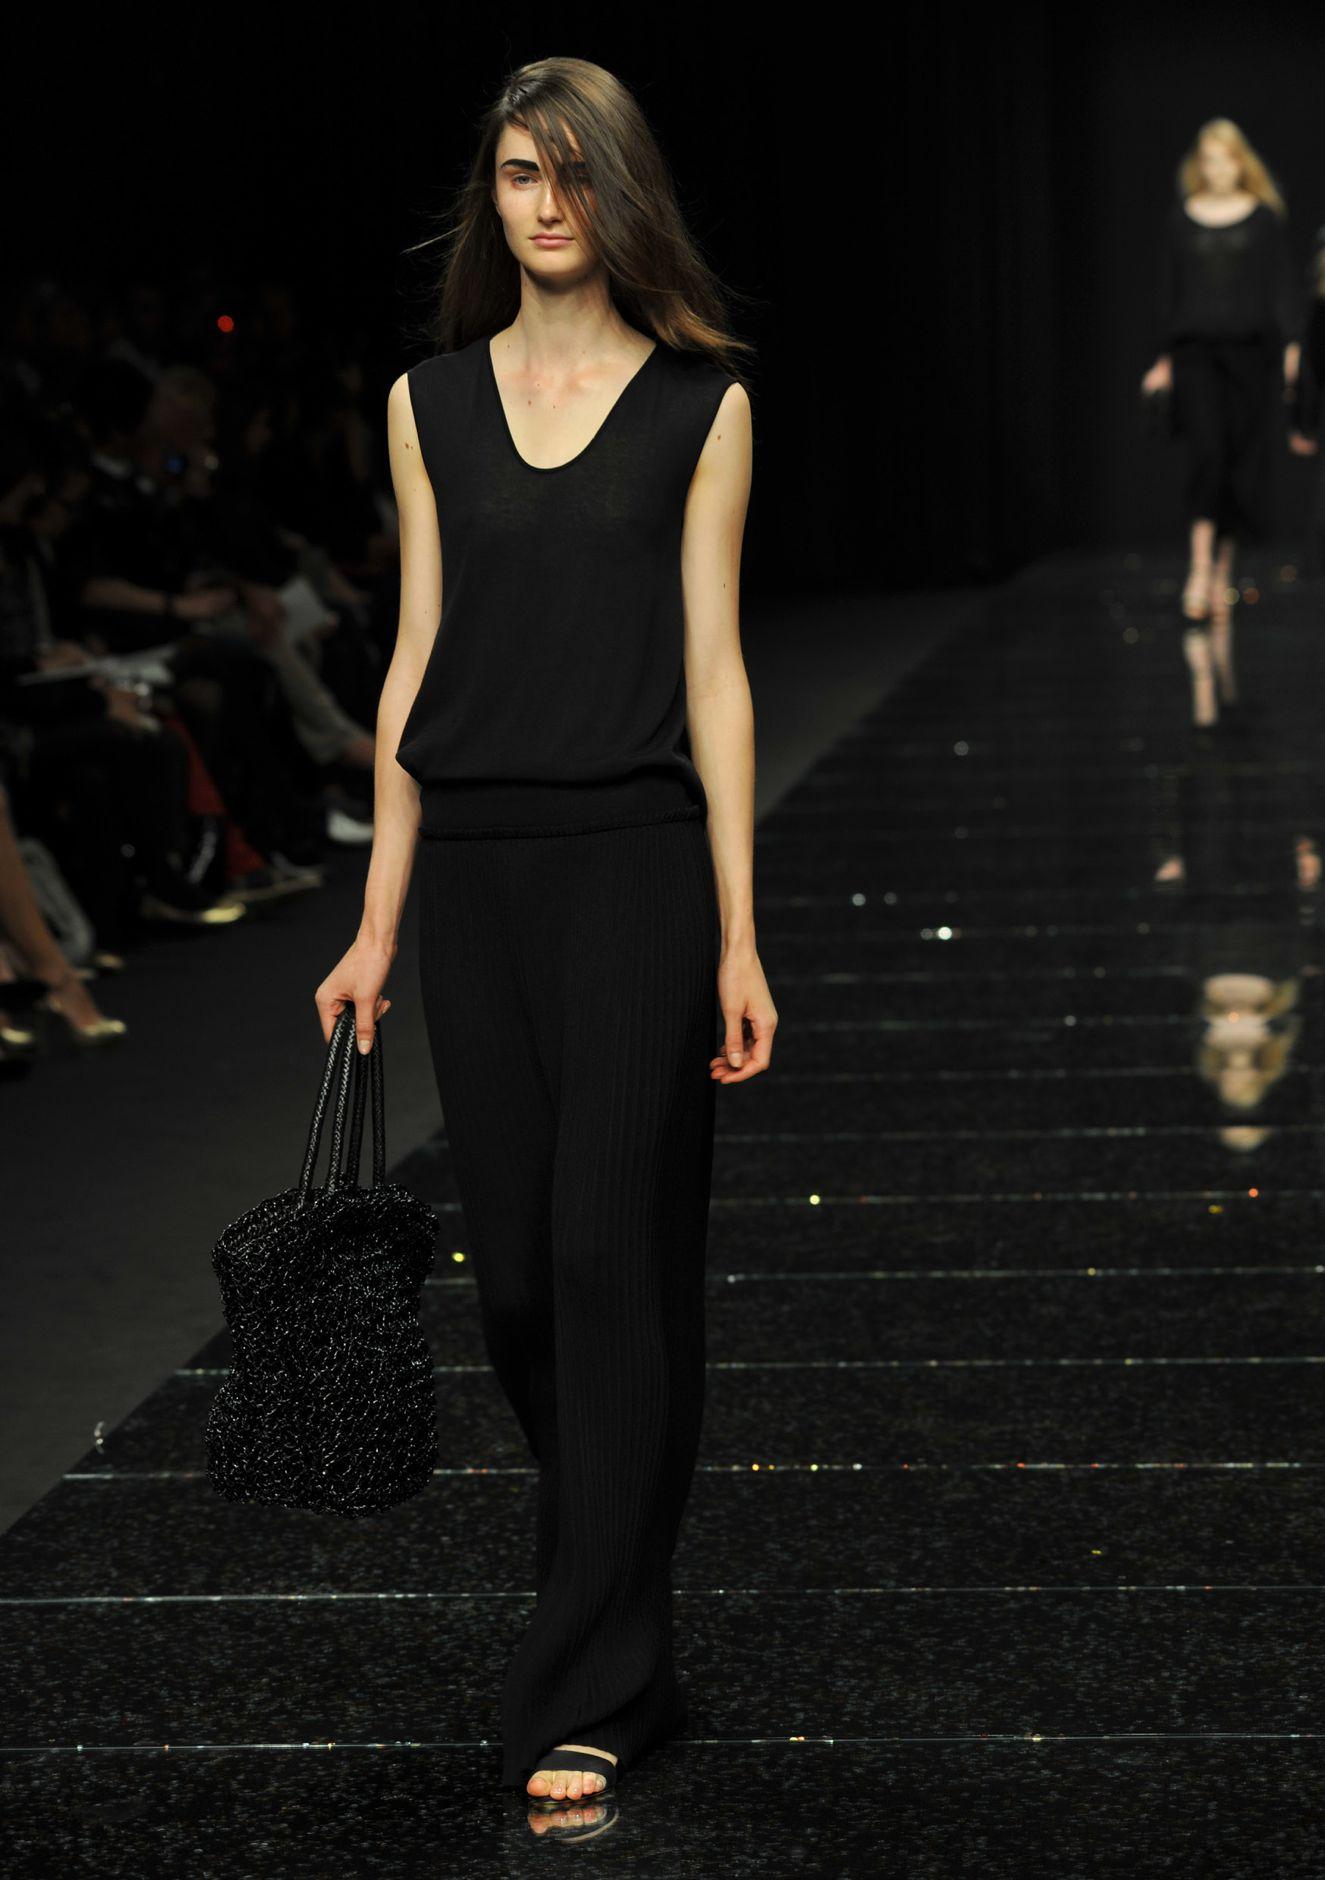 Anteprima Spring Summer 2013 Women Collection Milano Fashion Week